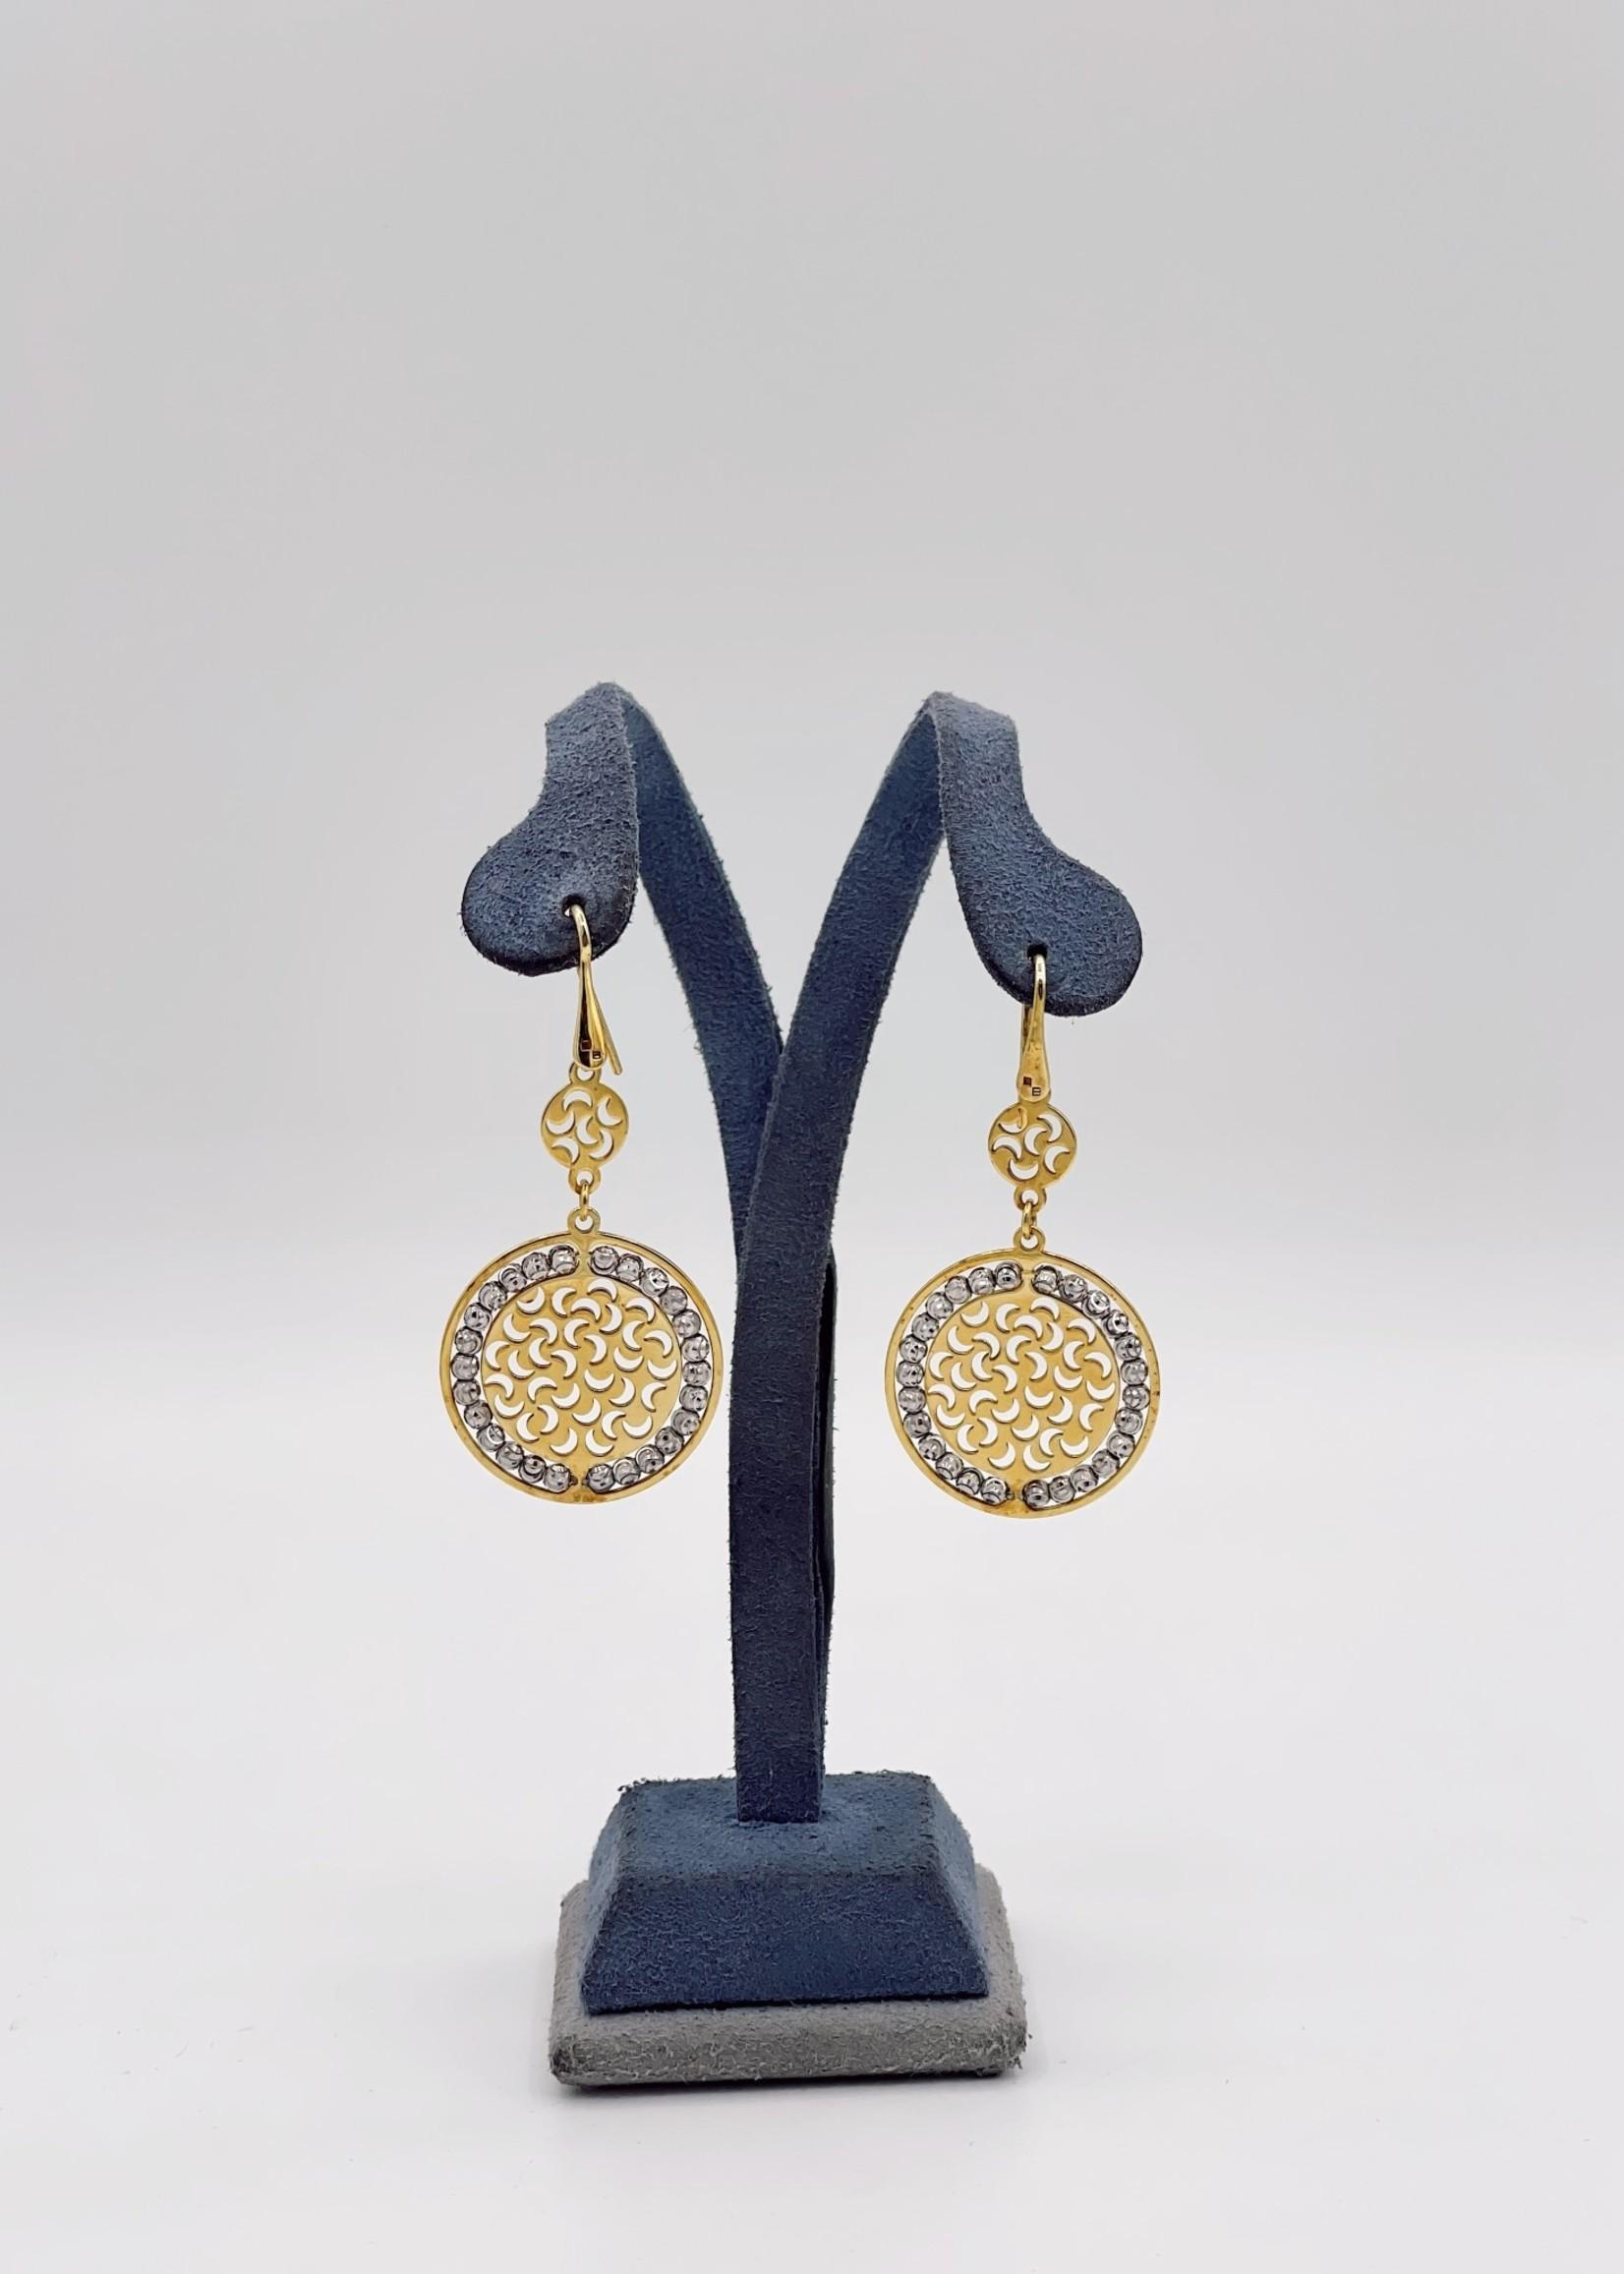 Officina Bernardi Sole Drop Earrings